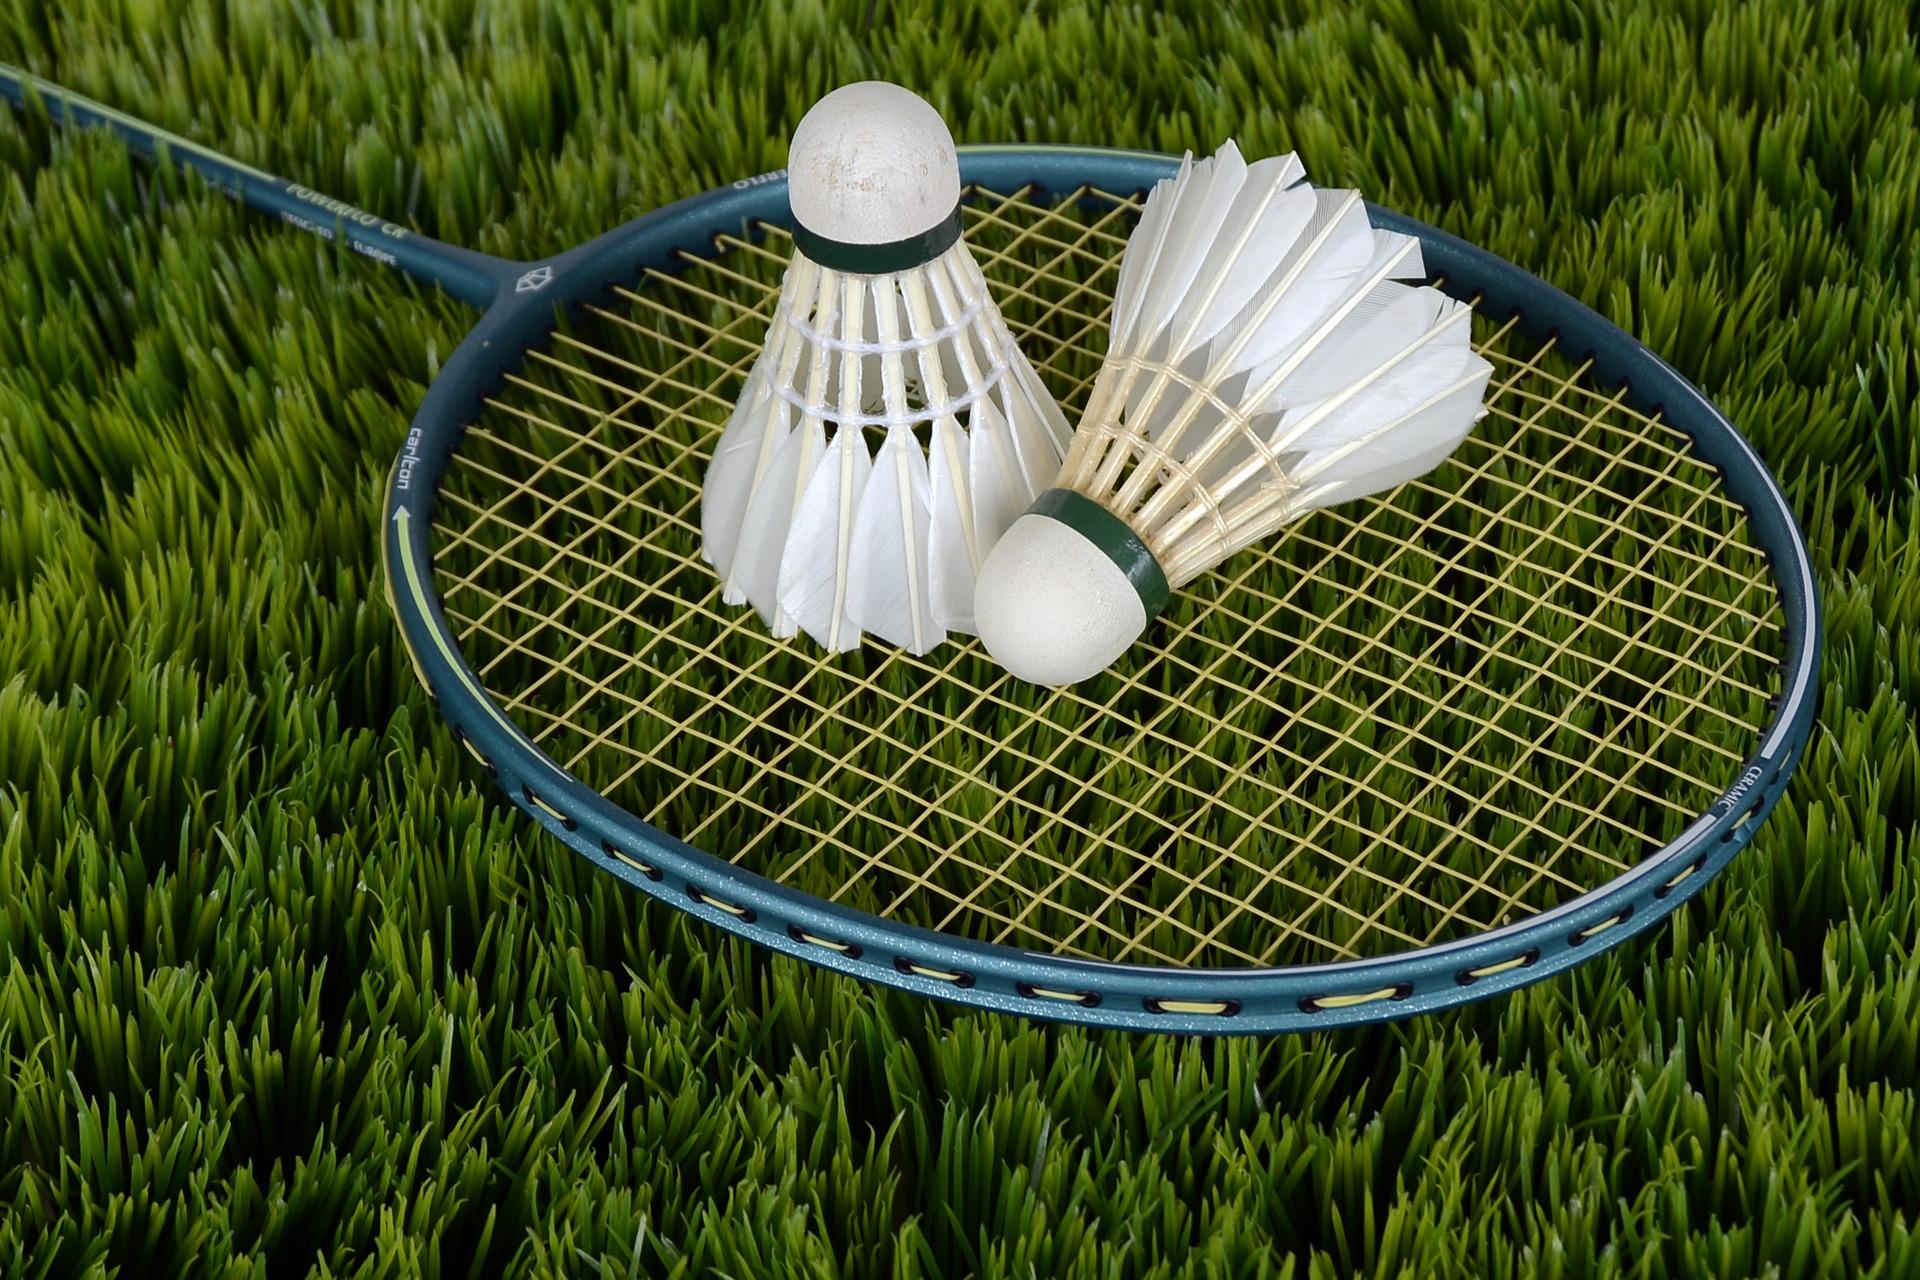 Badminton in the Park